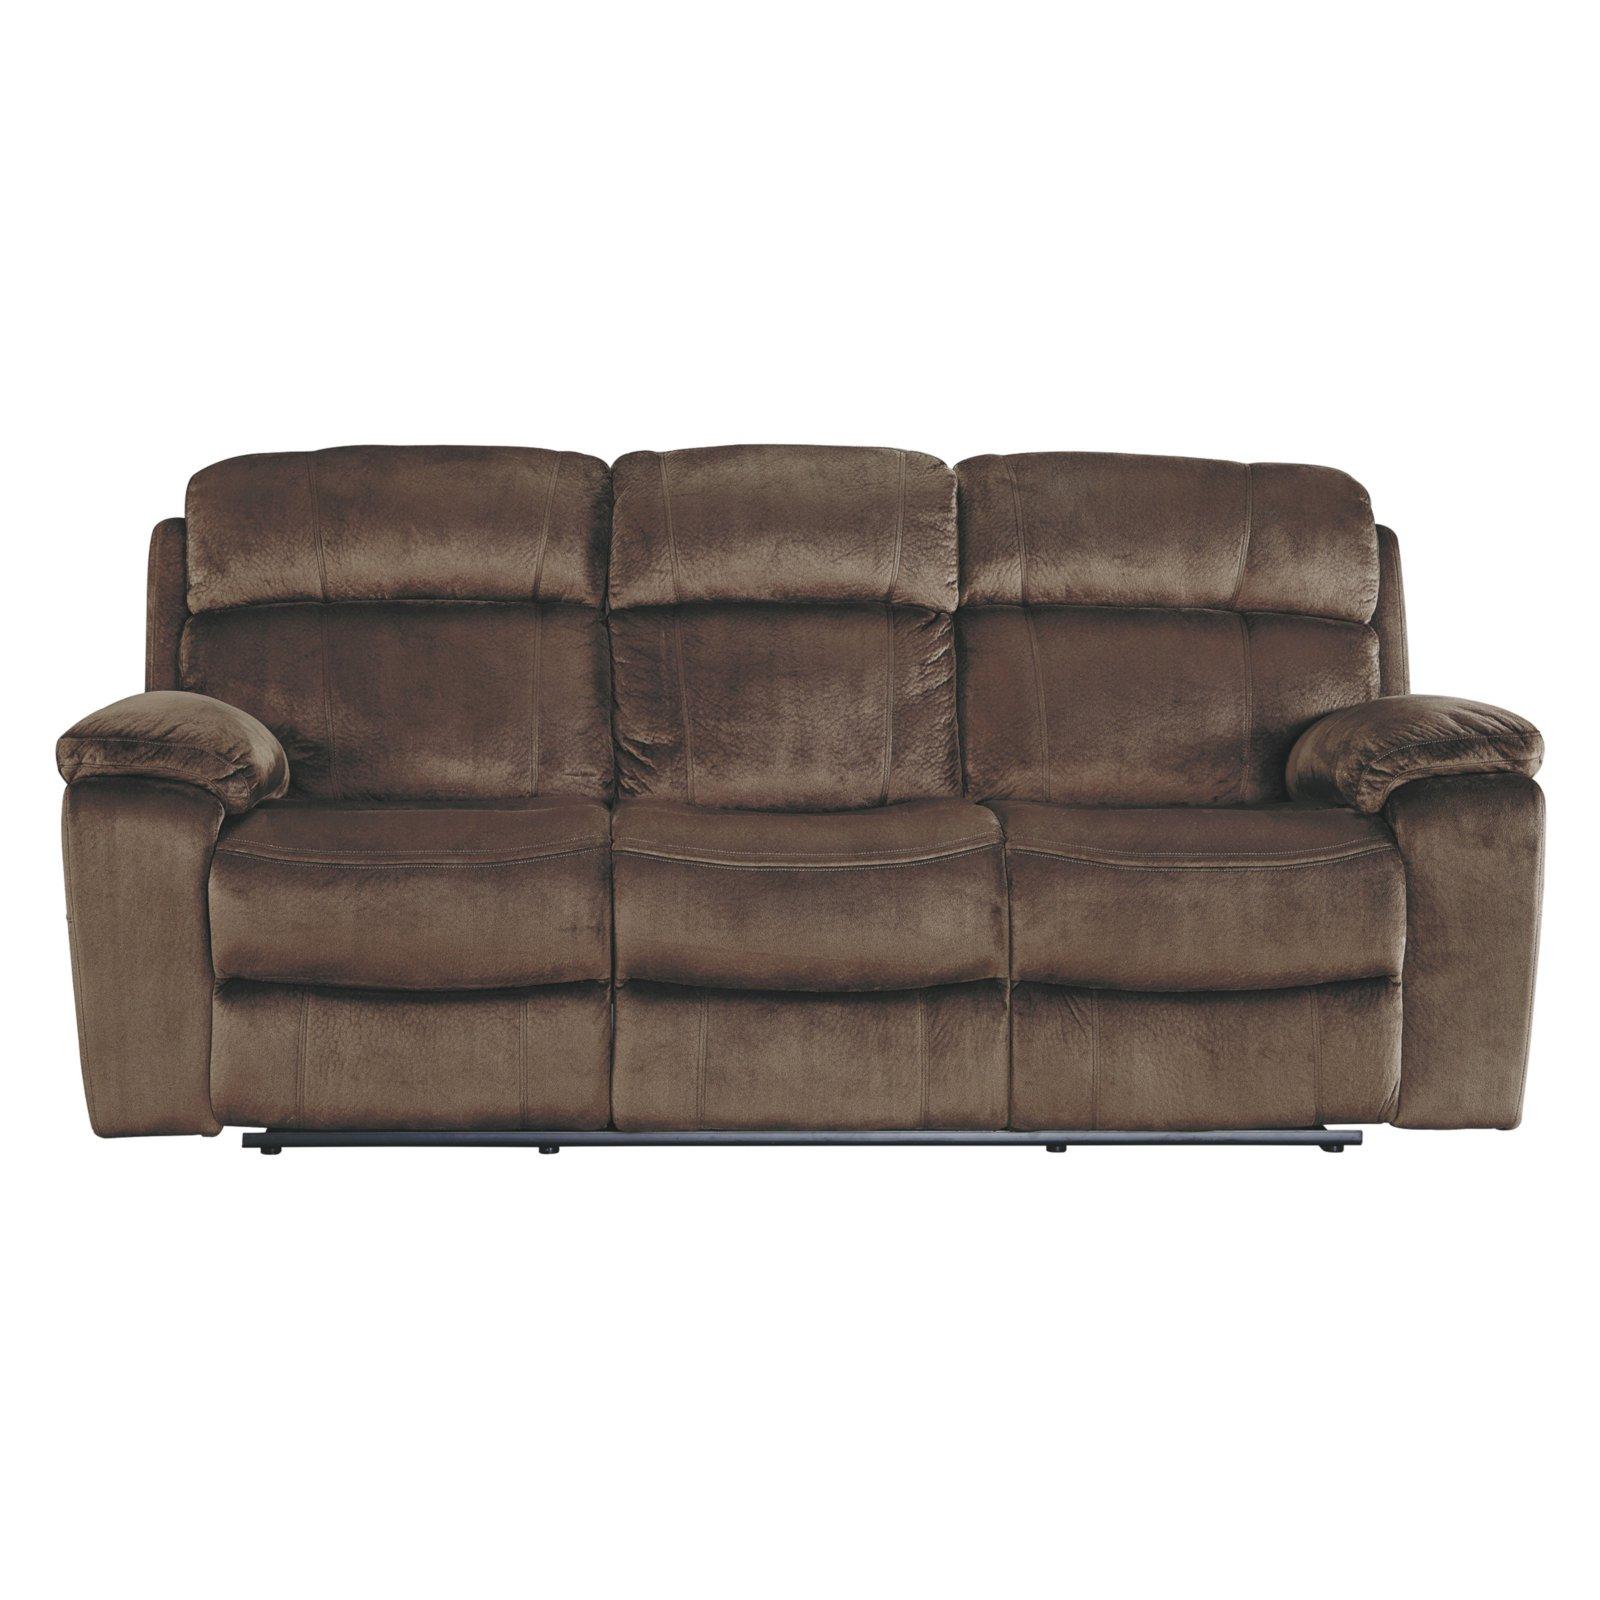 Pleasant Signature Design By Ashley Uhland Power Reclining Sofa Home Interior And Landscaping Ologienasavecom